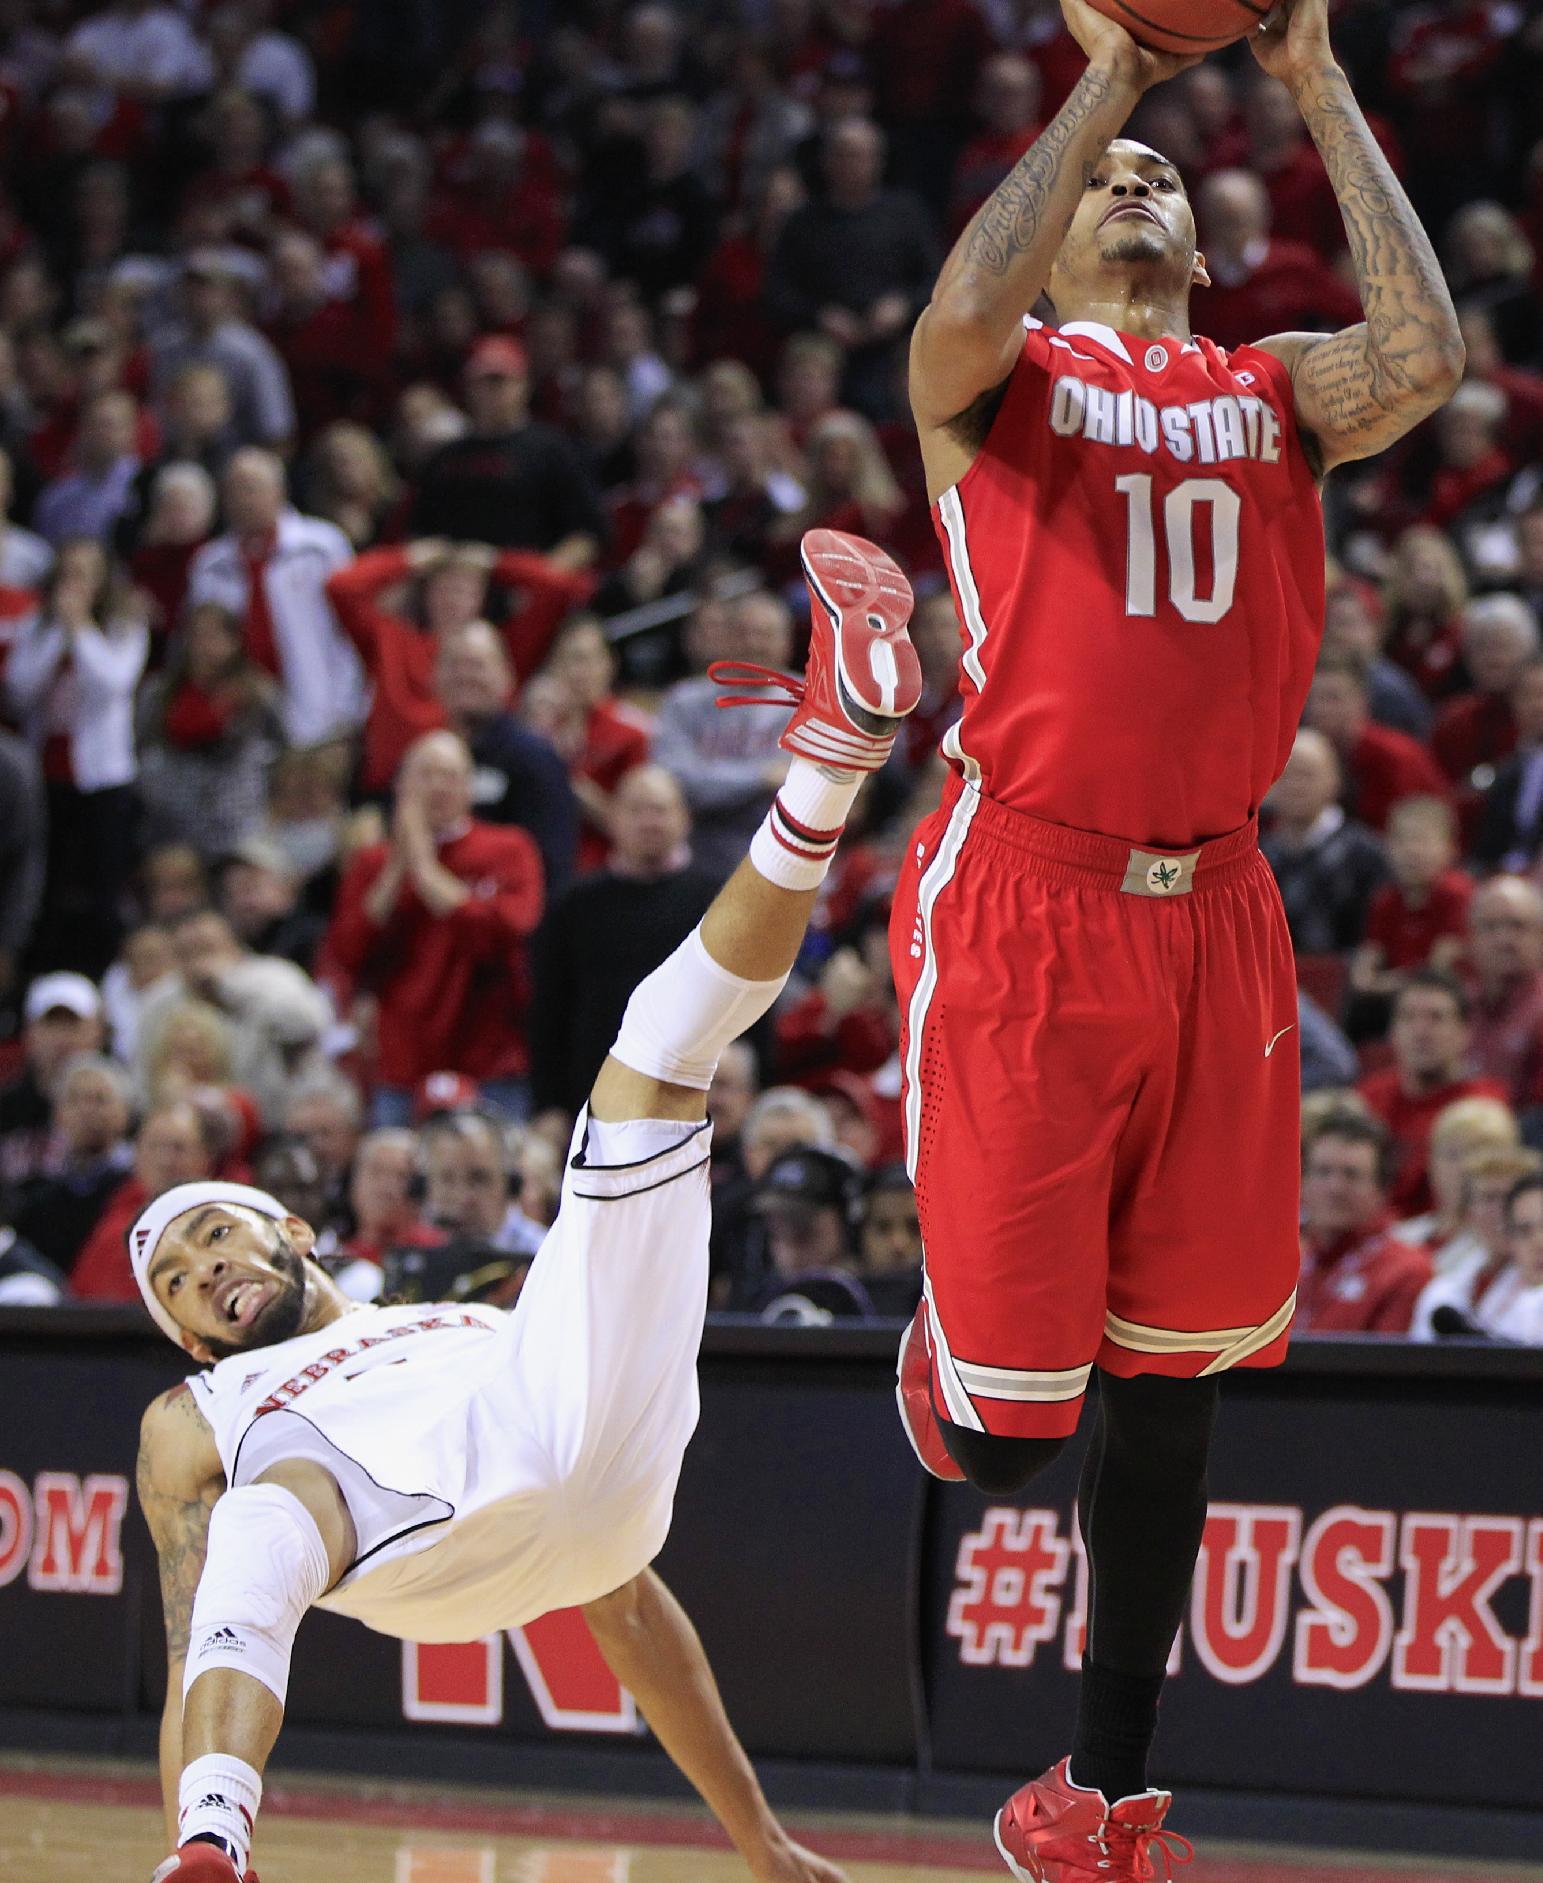 Nebraska upsets struggling No. 17 Ohio State 68-62